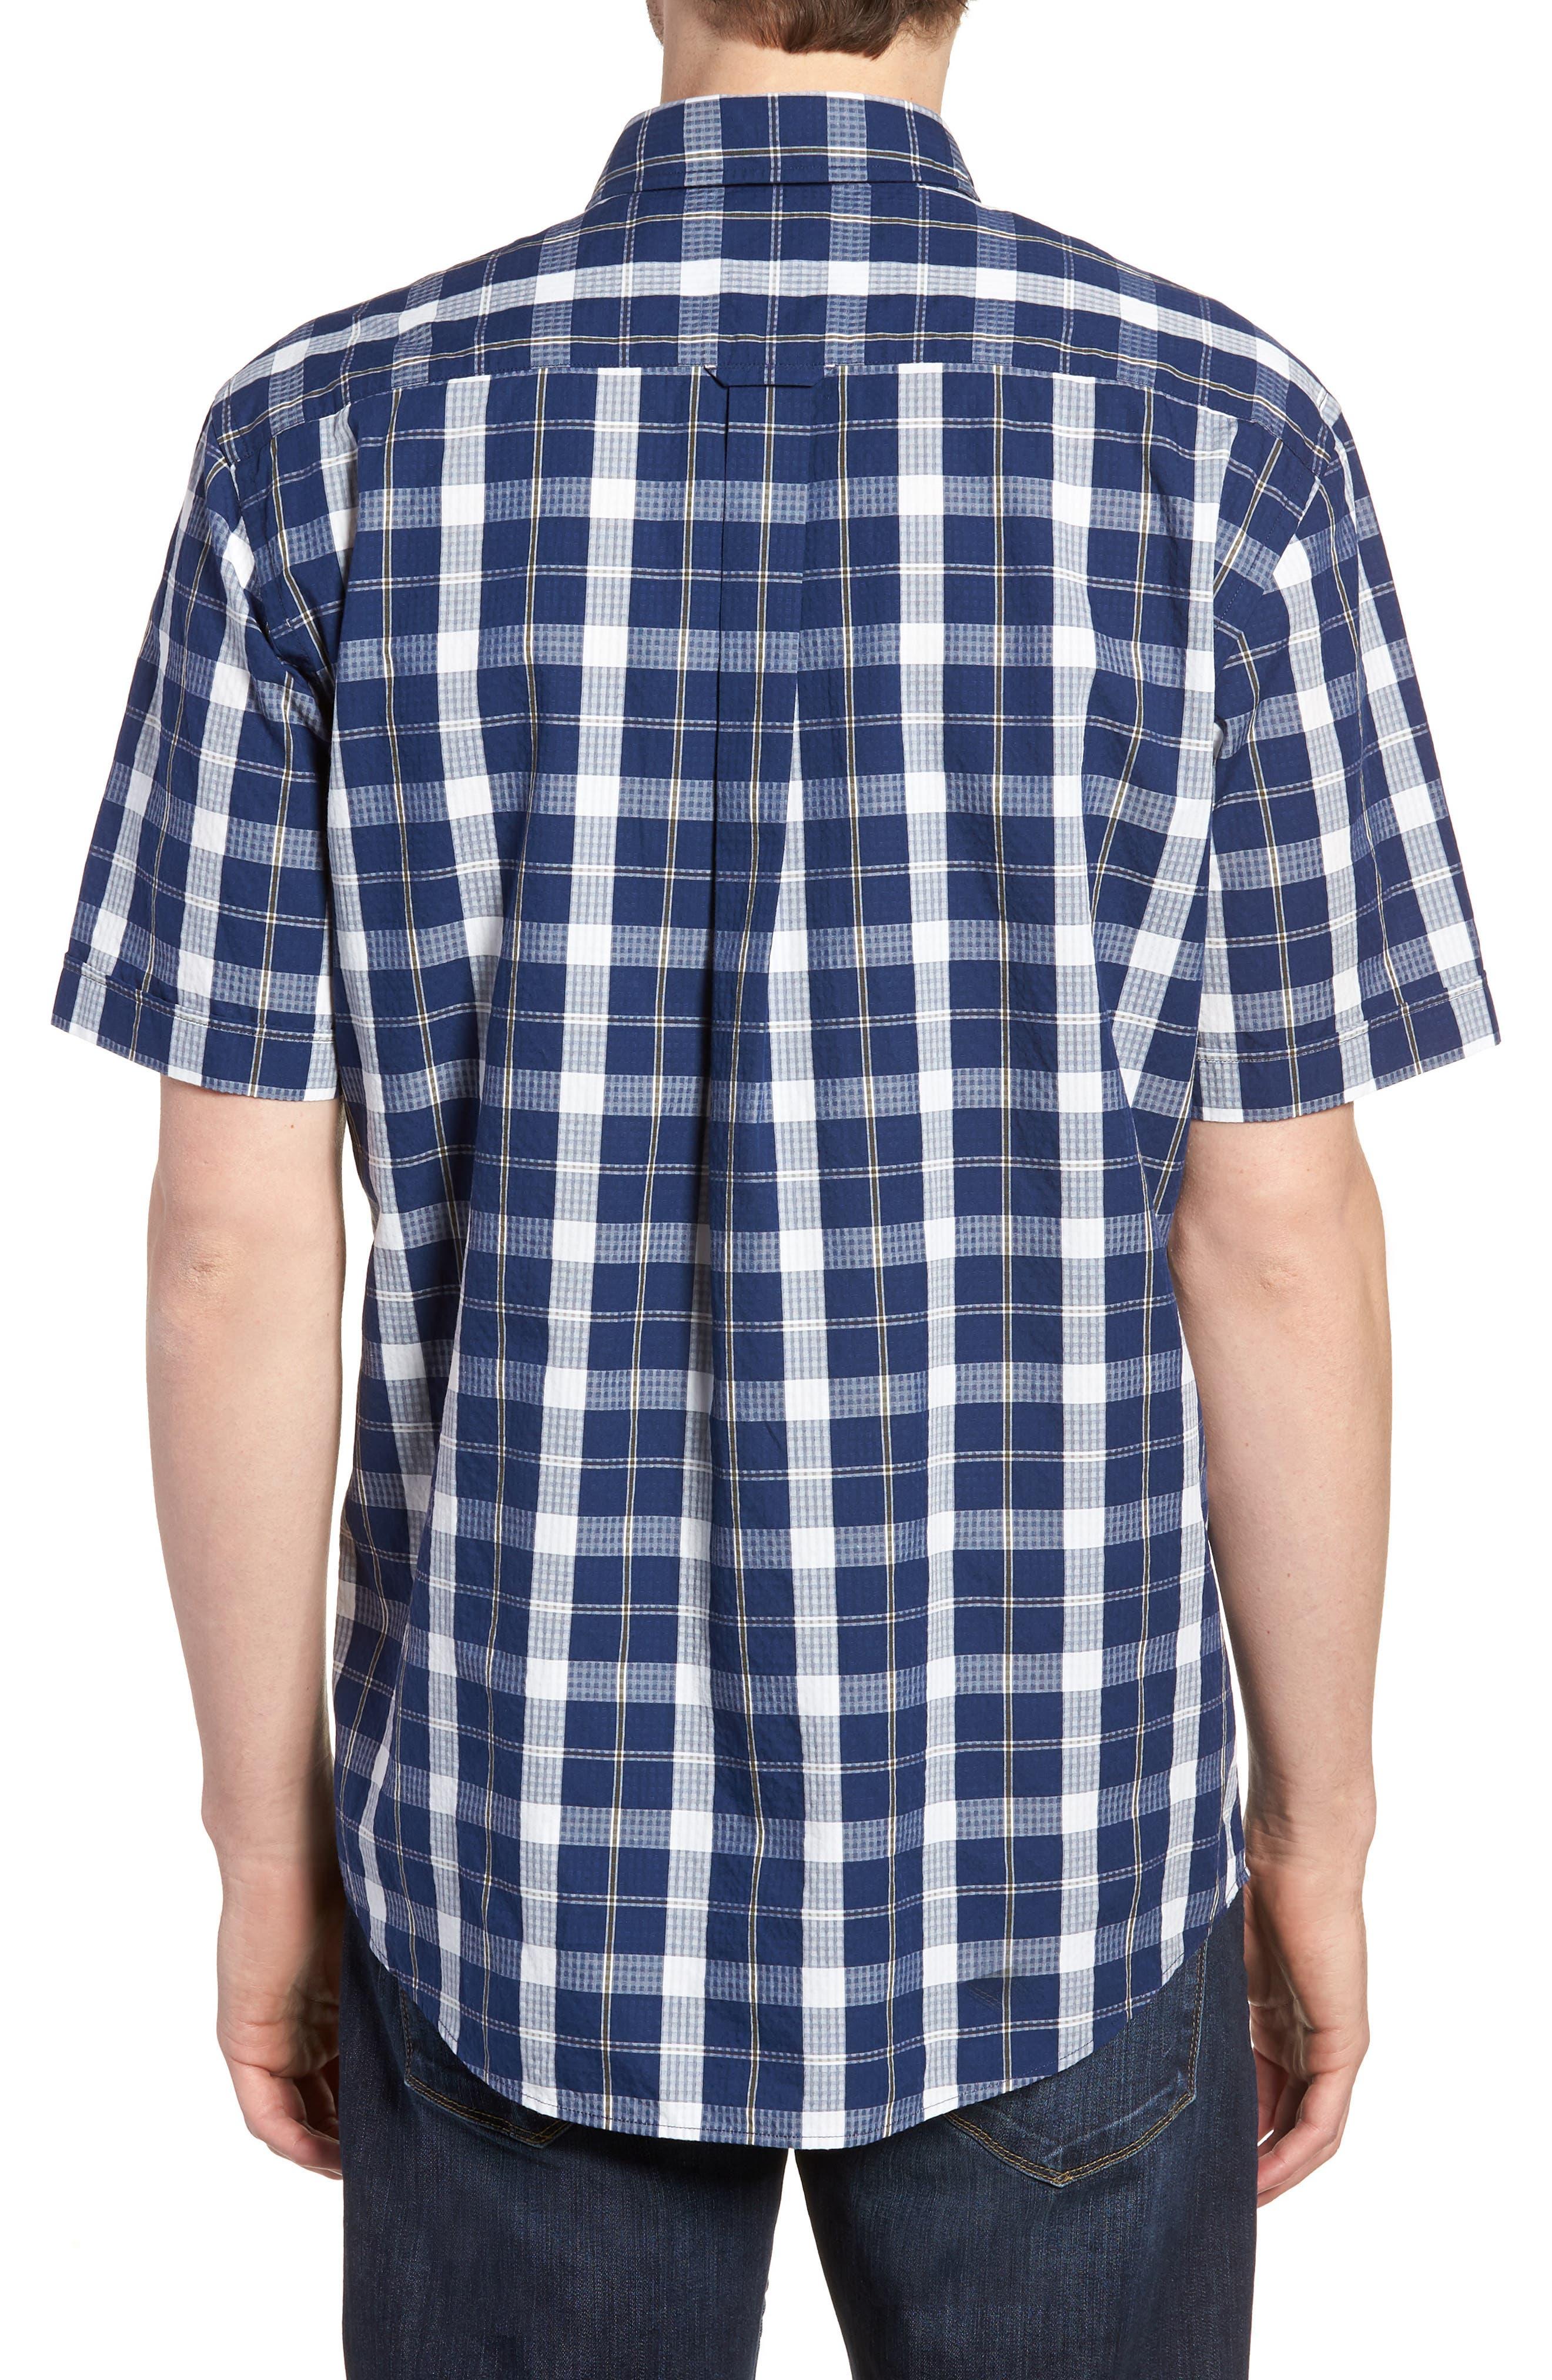 Bradford Regular Fit Sport Shirt,                             Alternate thumbnail 2, color,                             410